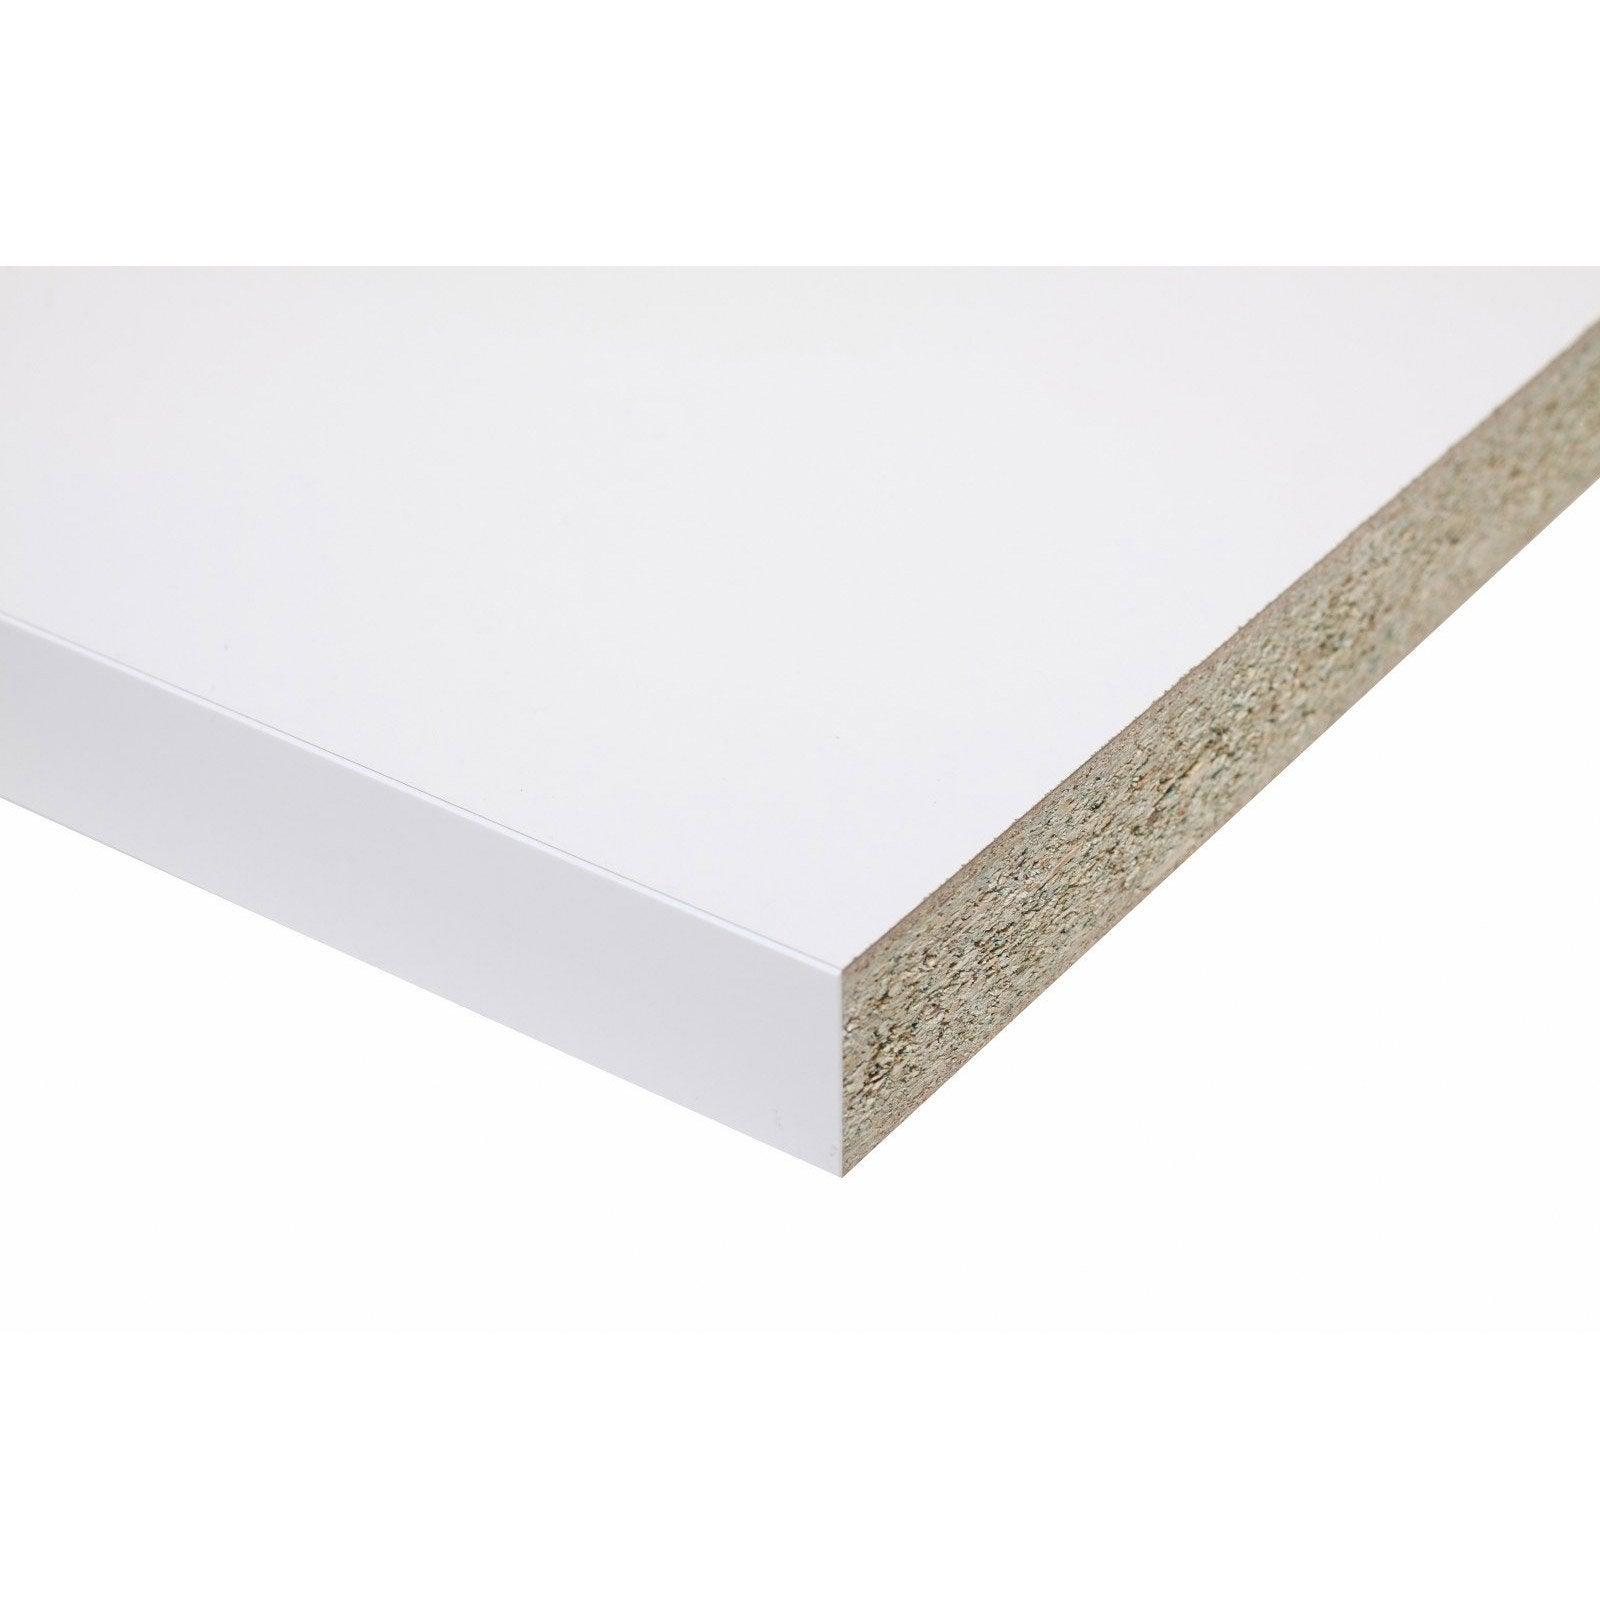 Micro Rayure Plan De Travail Stratifié plan de travail stratifié blanc brillant l.315 x p.65 cm, ep.38 mm